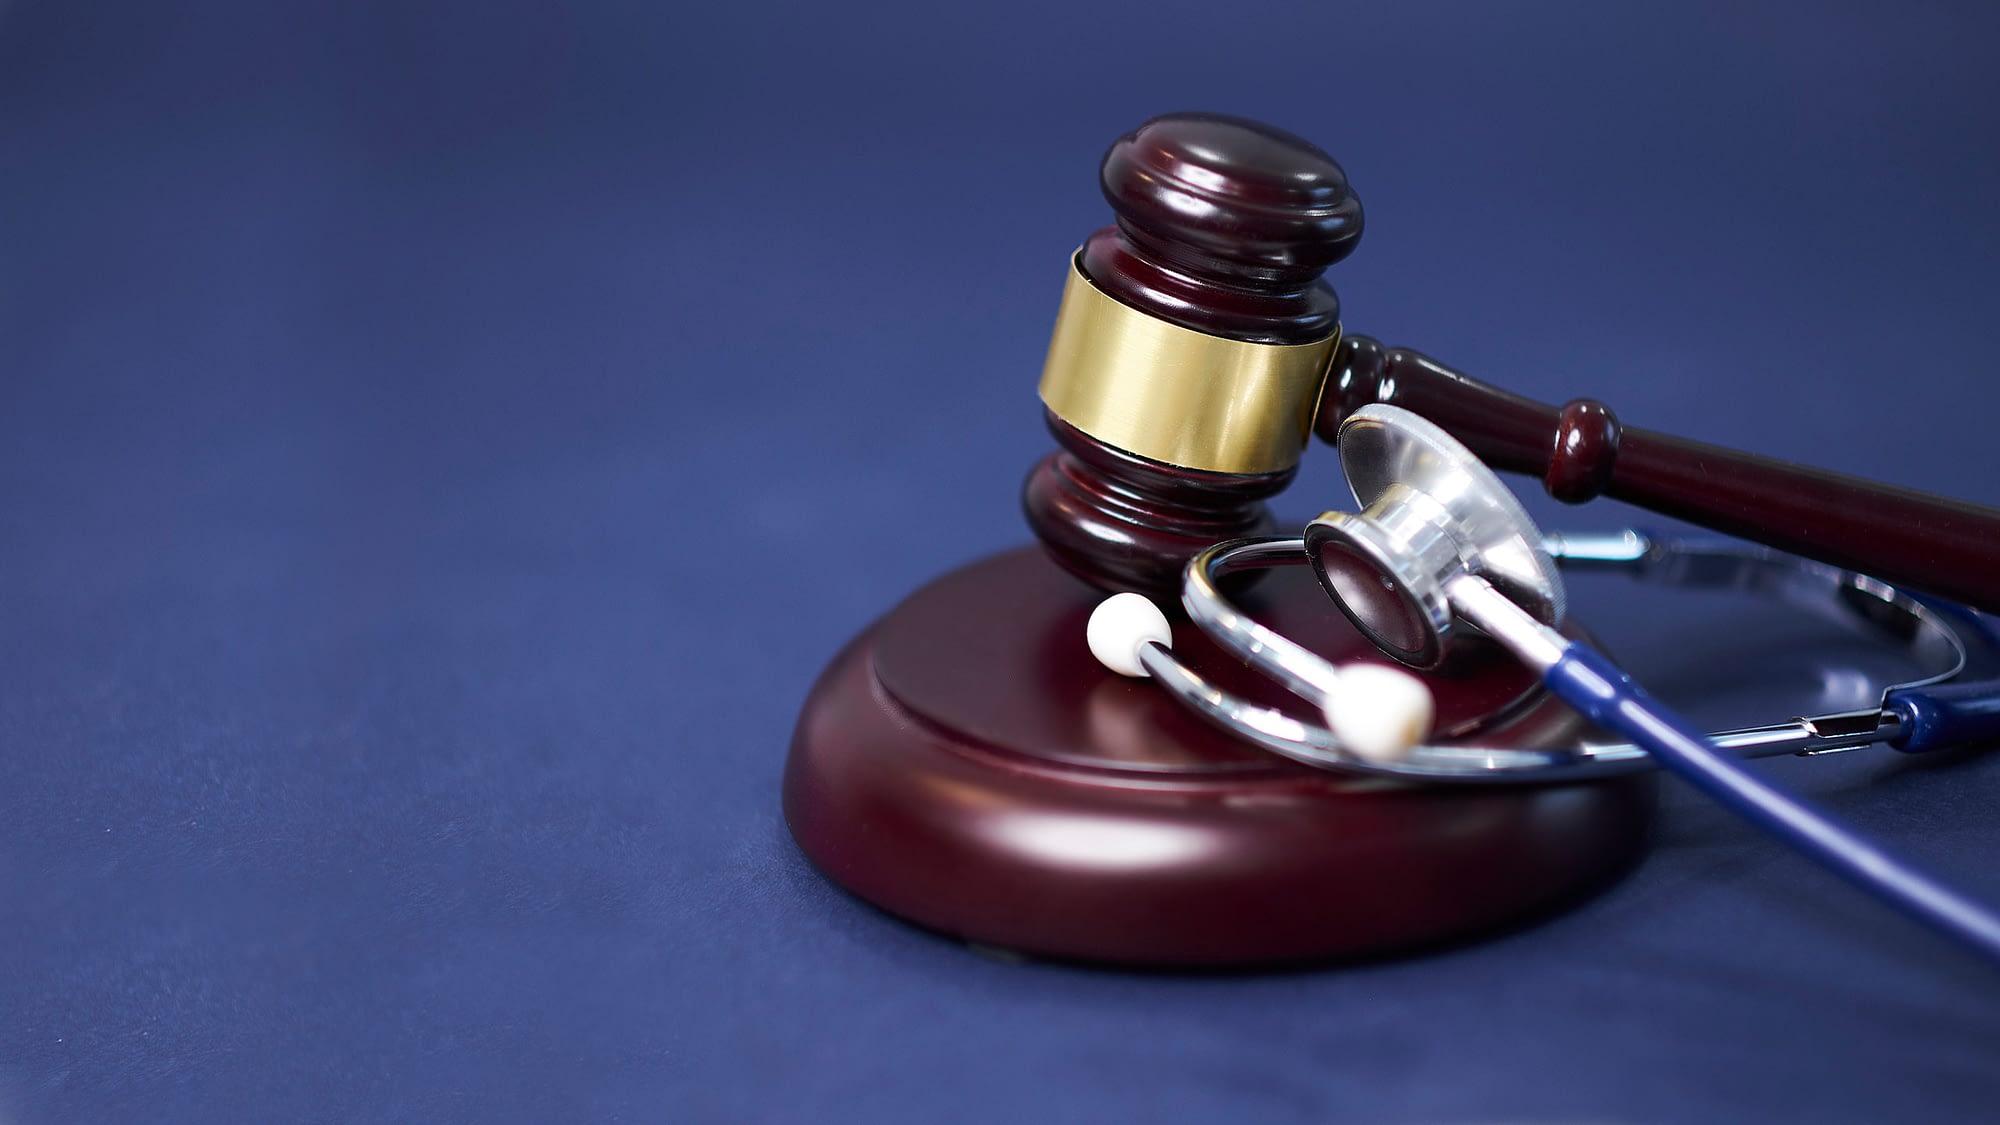 $9.27M Verdict Shatters California's $250K Medical Malpractice Cap